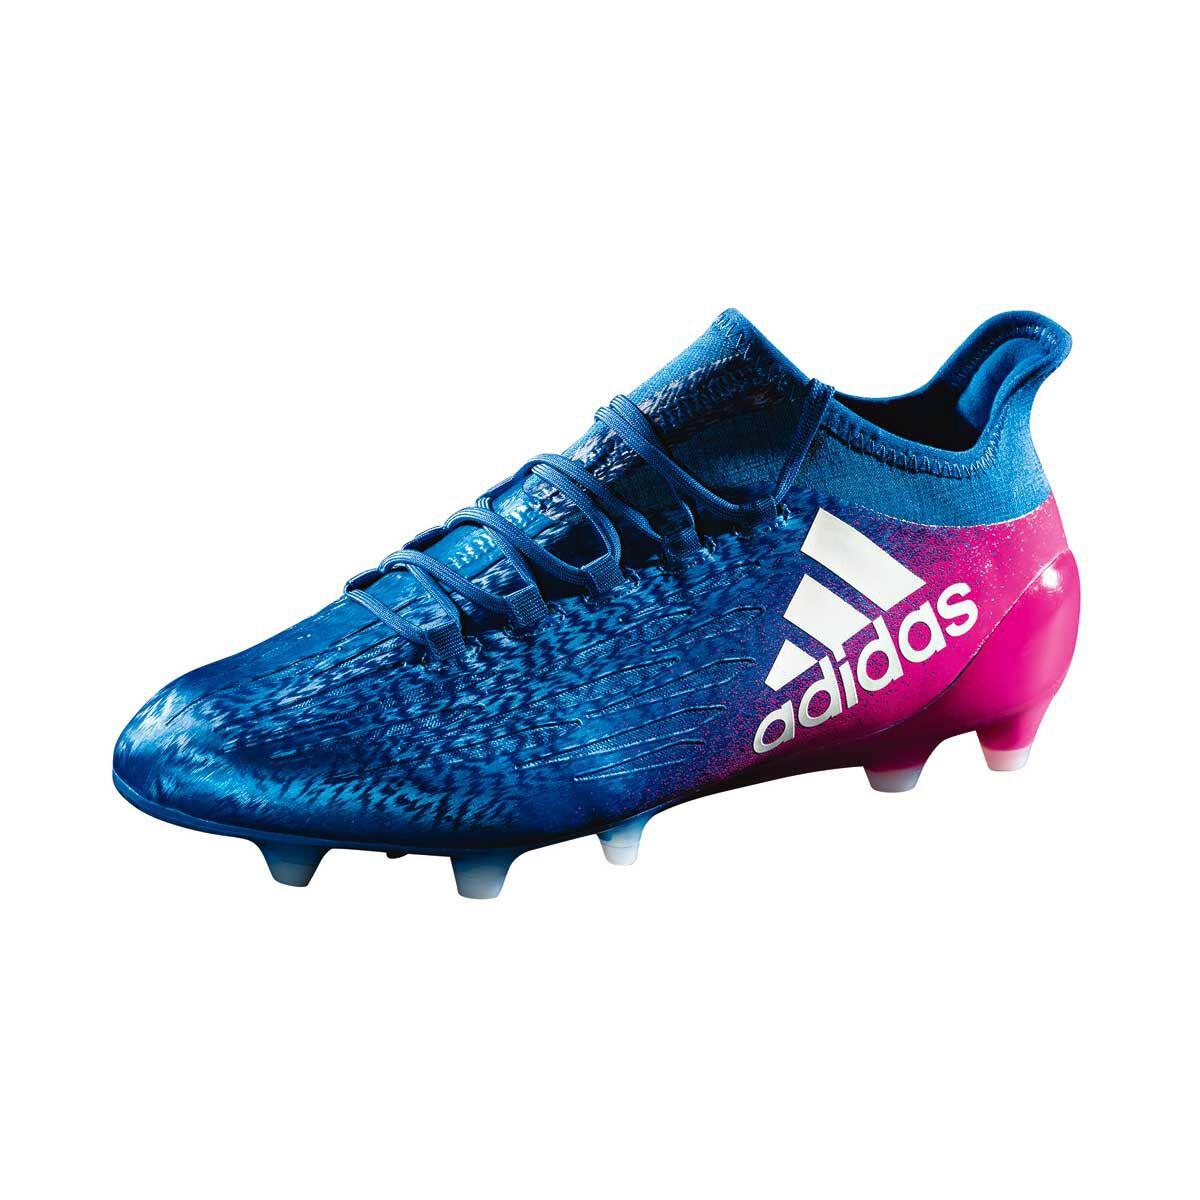 42eeb2a70b94 ... cleats 13303 129cf  sweden adidas x16.1 mens football boots blue white  us 11 adult blue 66e4a e8dba